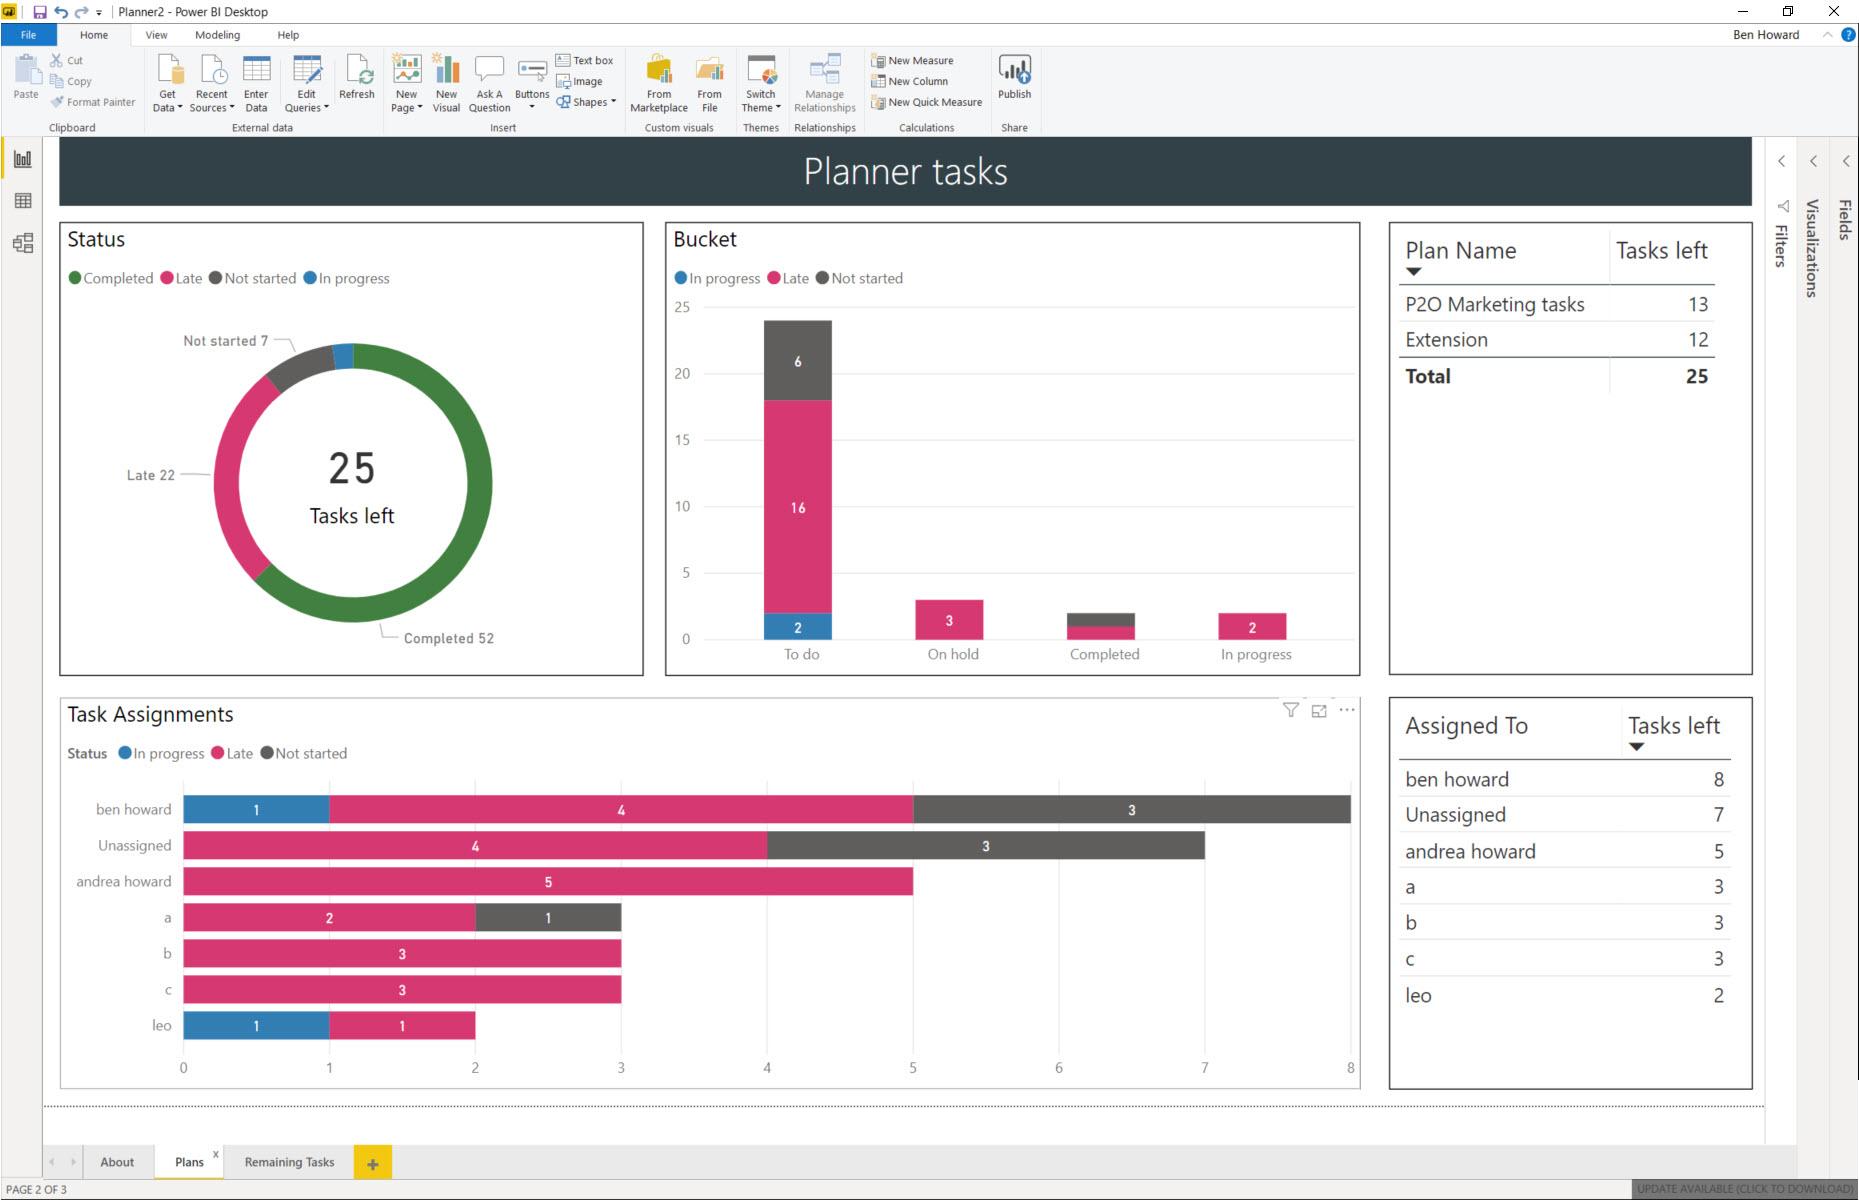 PowerBI Template for Exported Planner Plans - Applepark